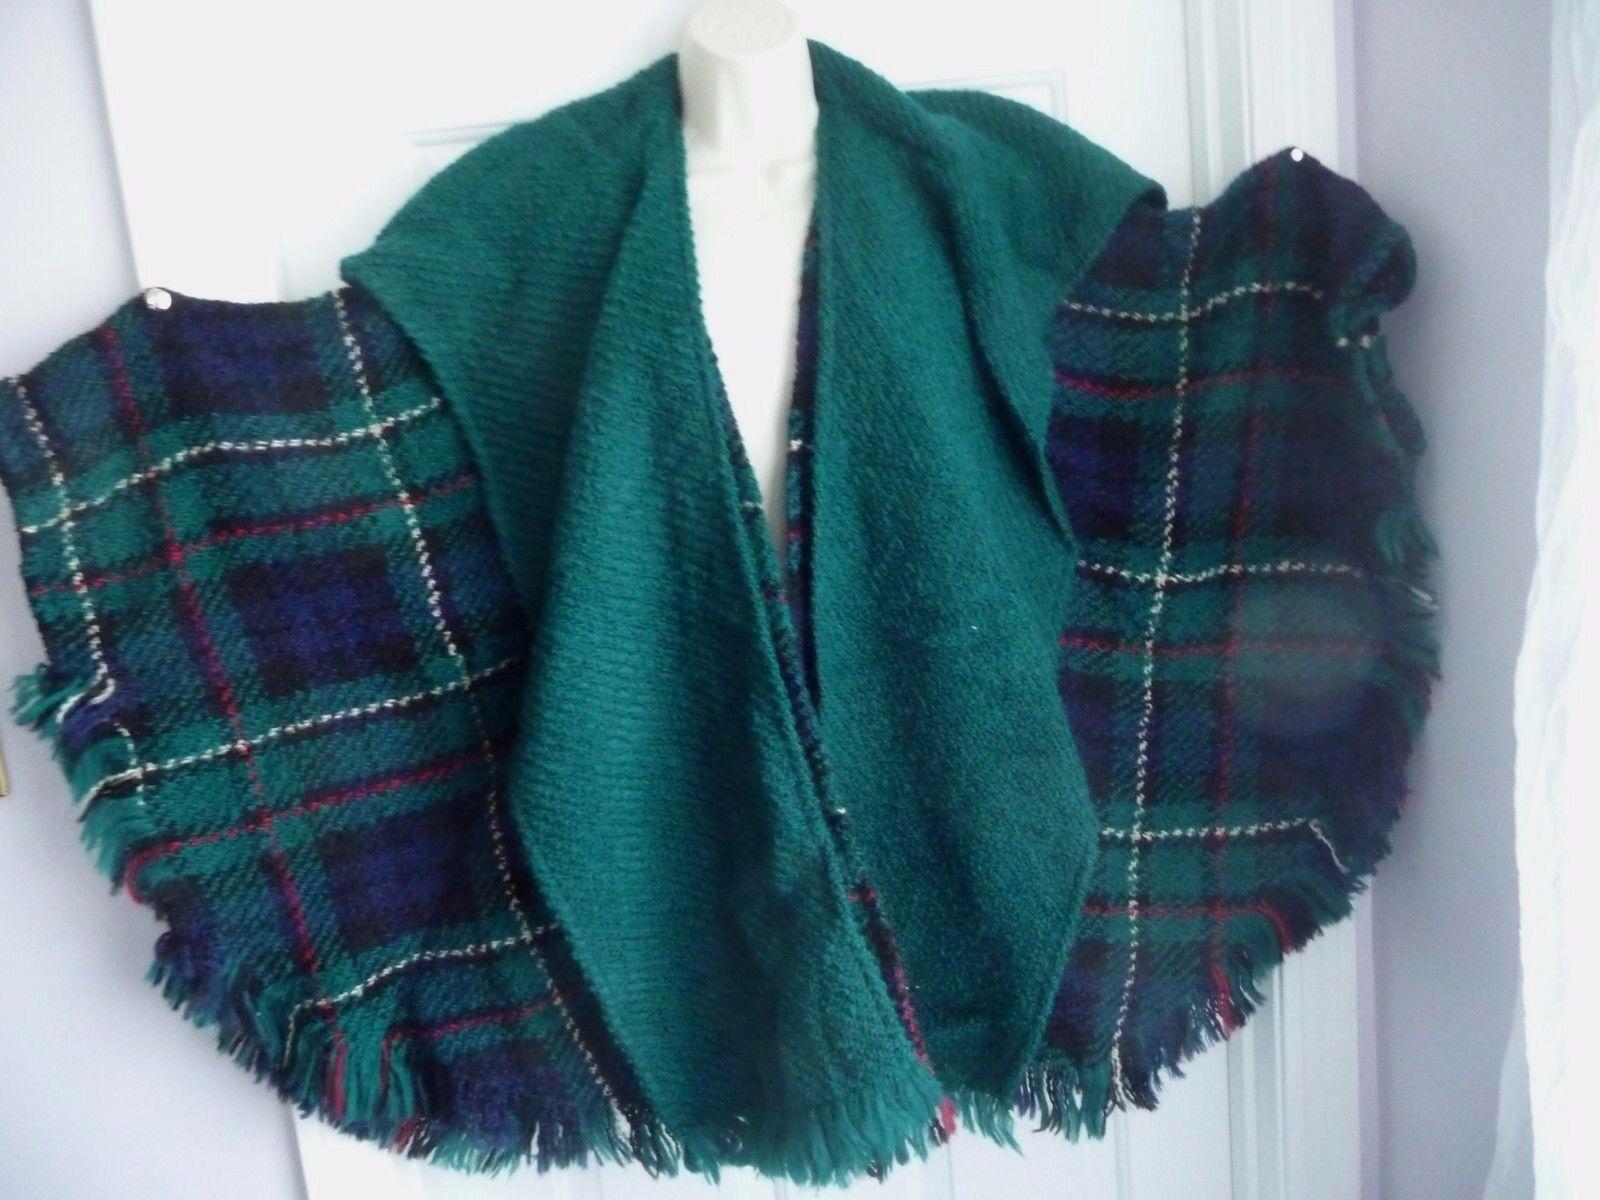 Boyne Valley Weavers Poncho Cape Sweater Irish Ireland Made Tweed Attached Scarf